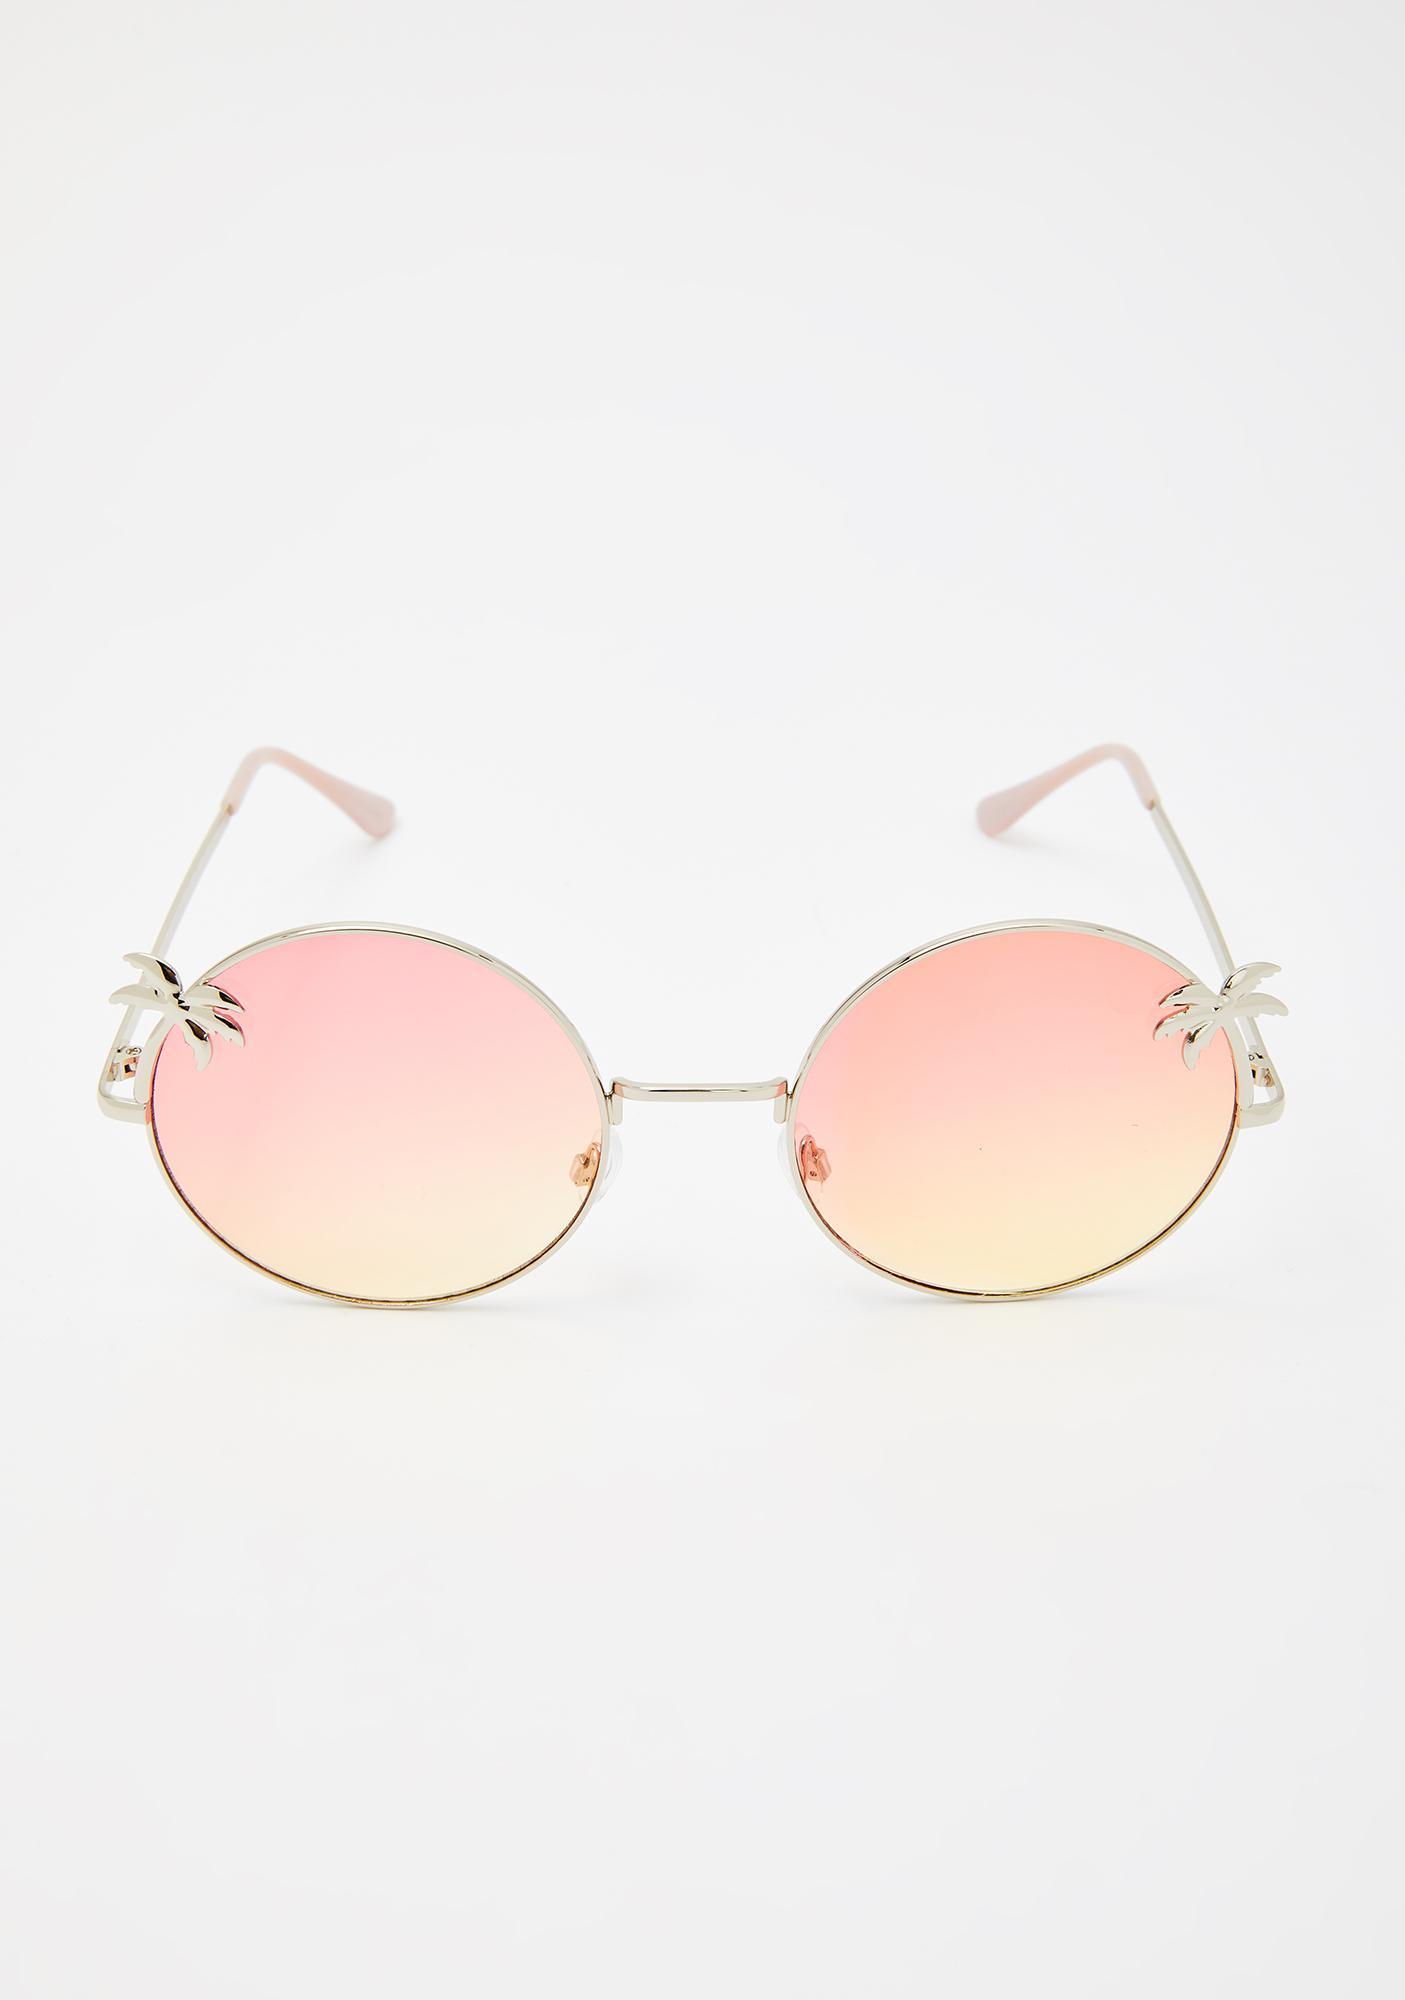 Palm Dreams Circle Sunglasses